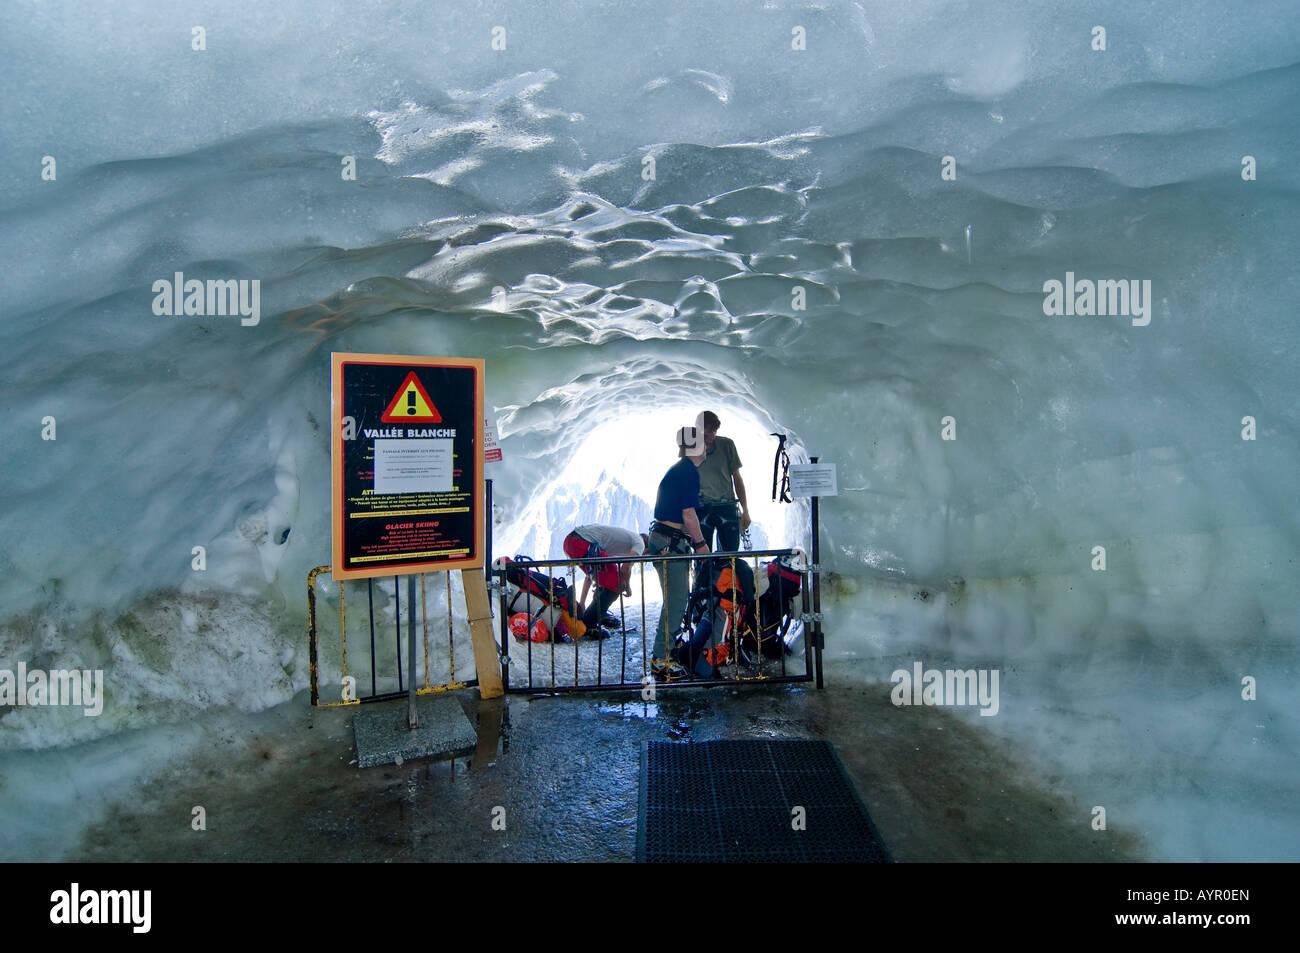 Ice grotto at the entrance to Col du Midi (Midi Pass), Mt. Aiguille du Midi, Mont Blanc Massif, Chamonix, France Stock Photo